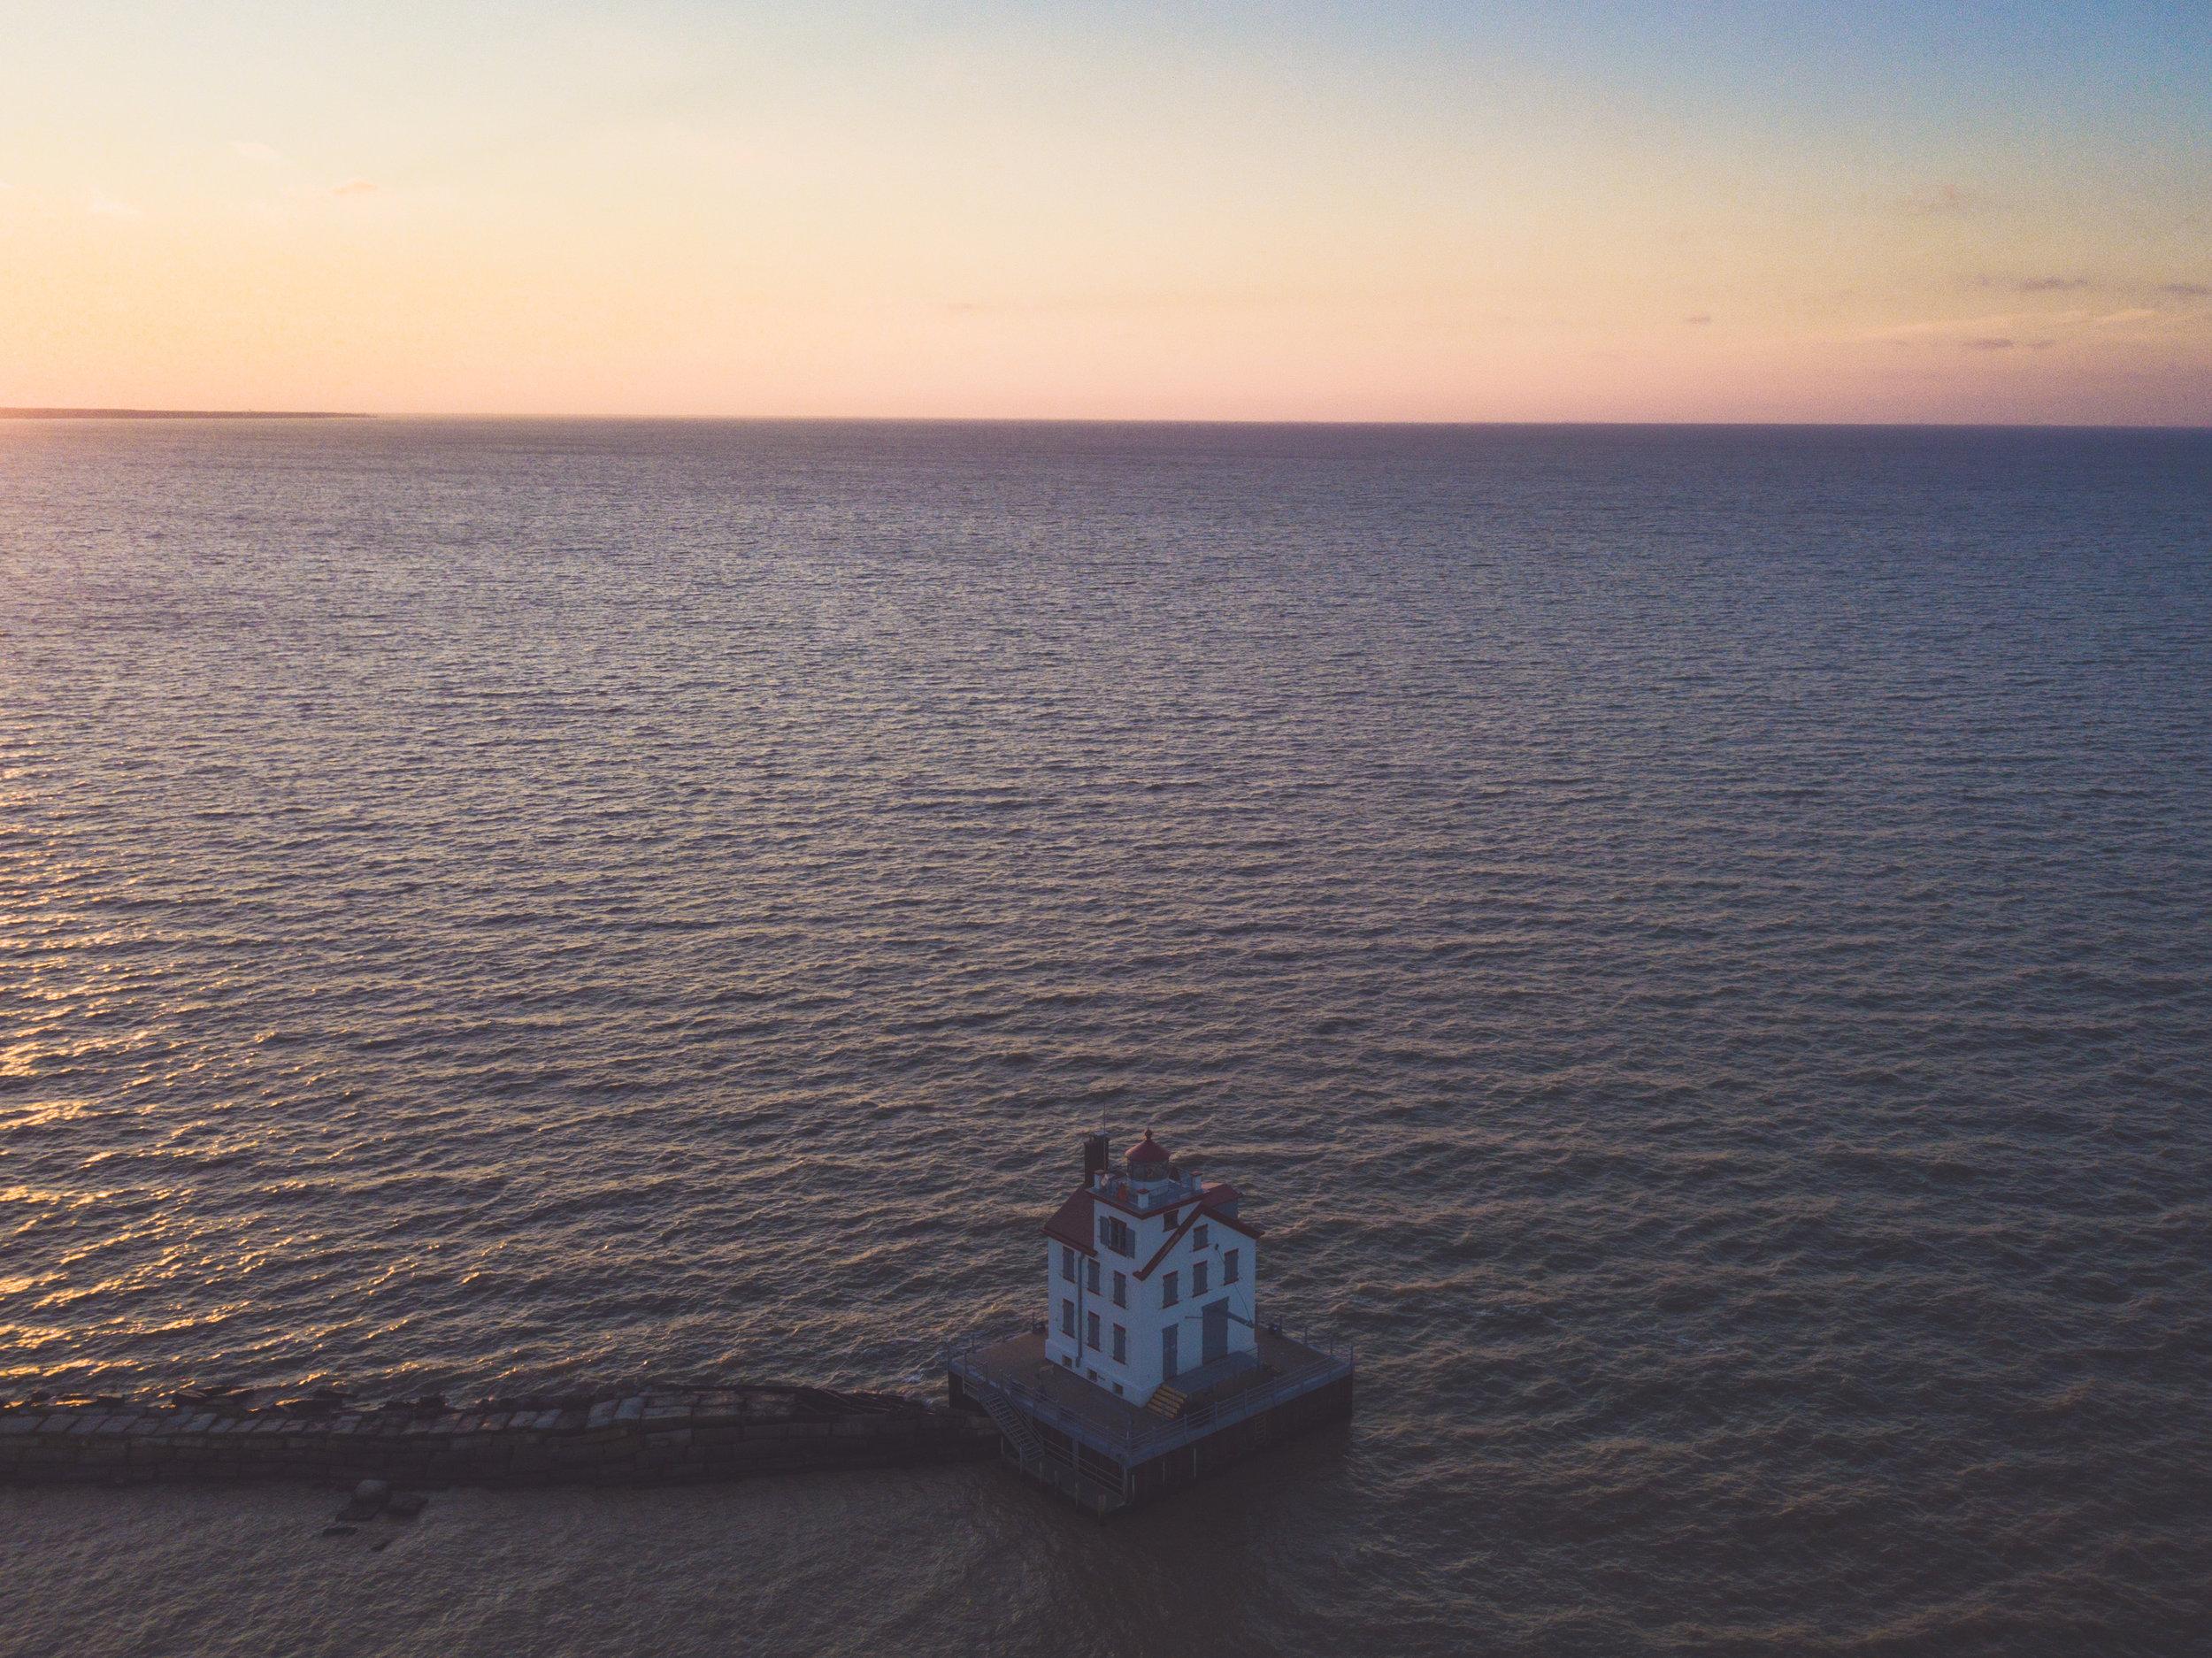 lorain_lighthouse-002.jpg